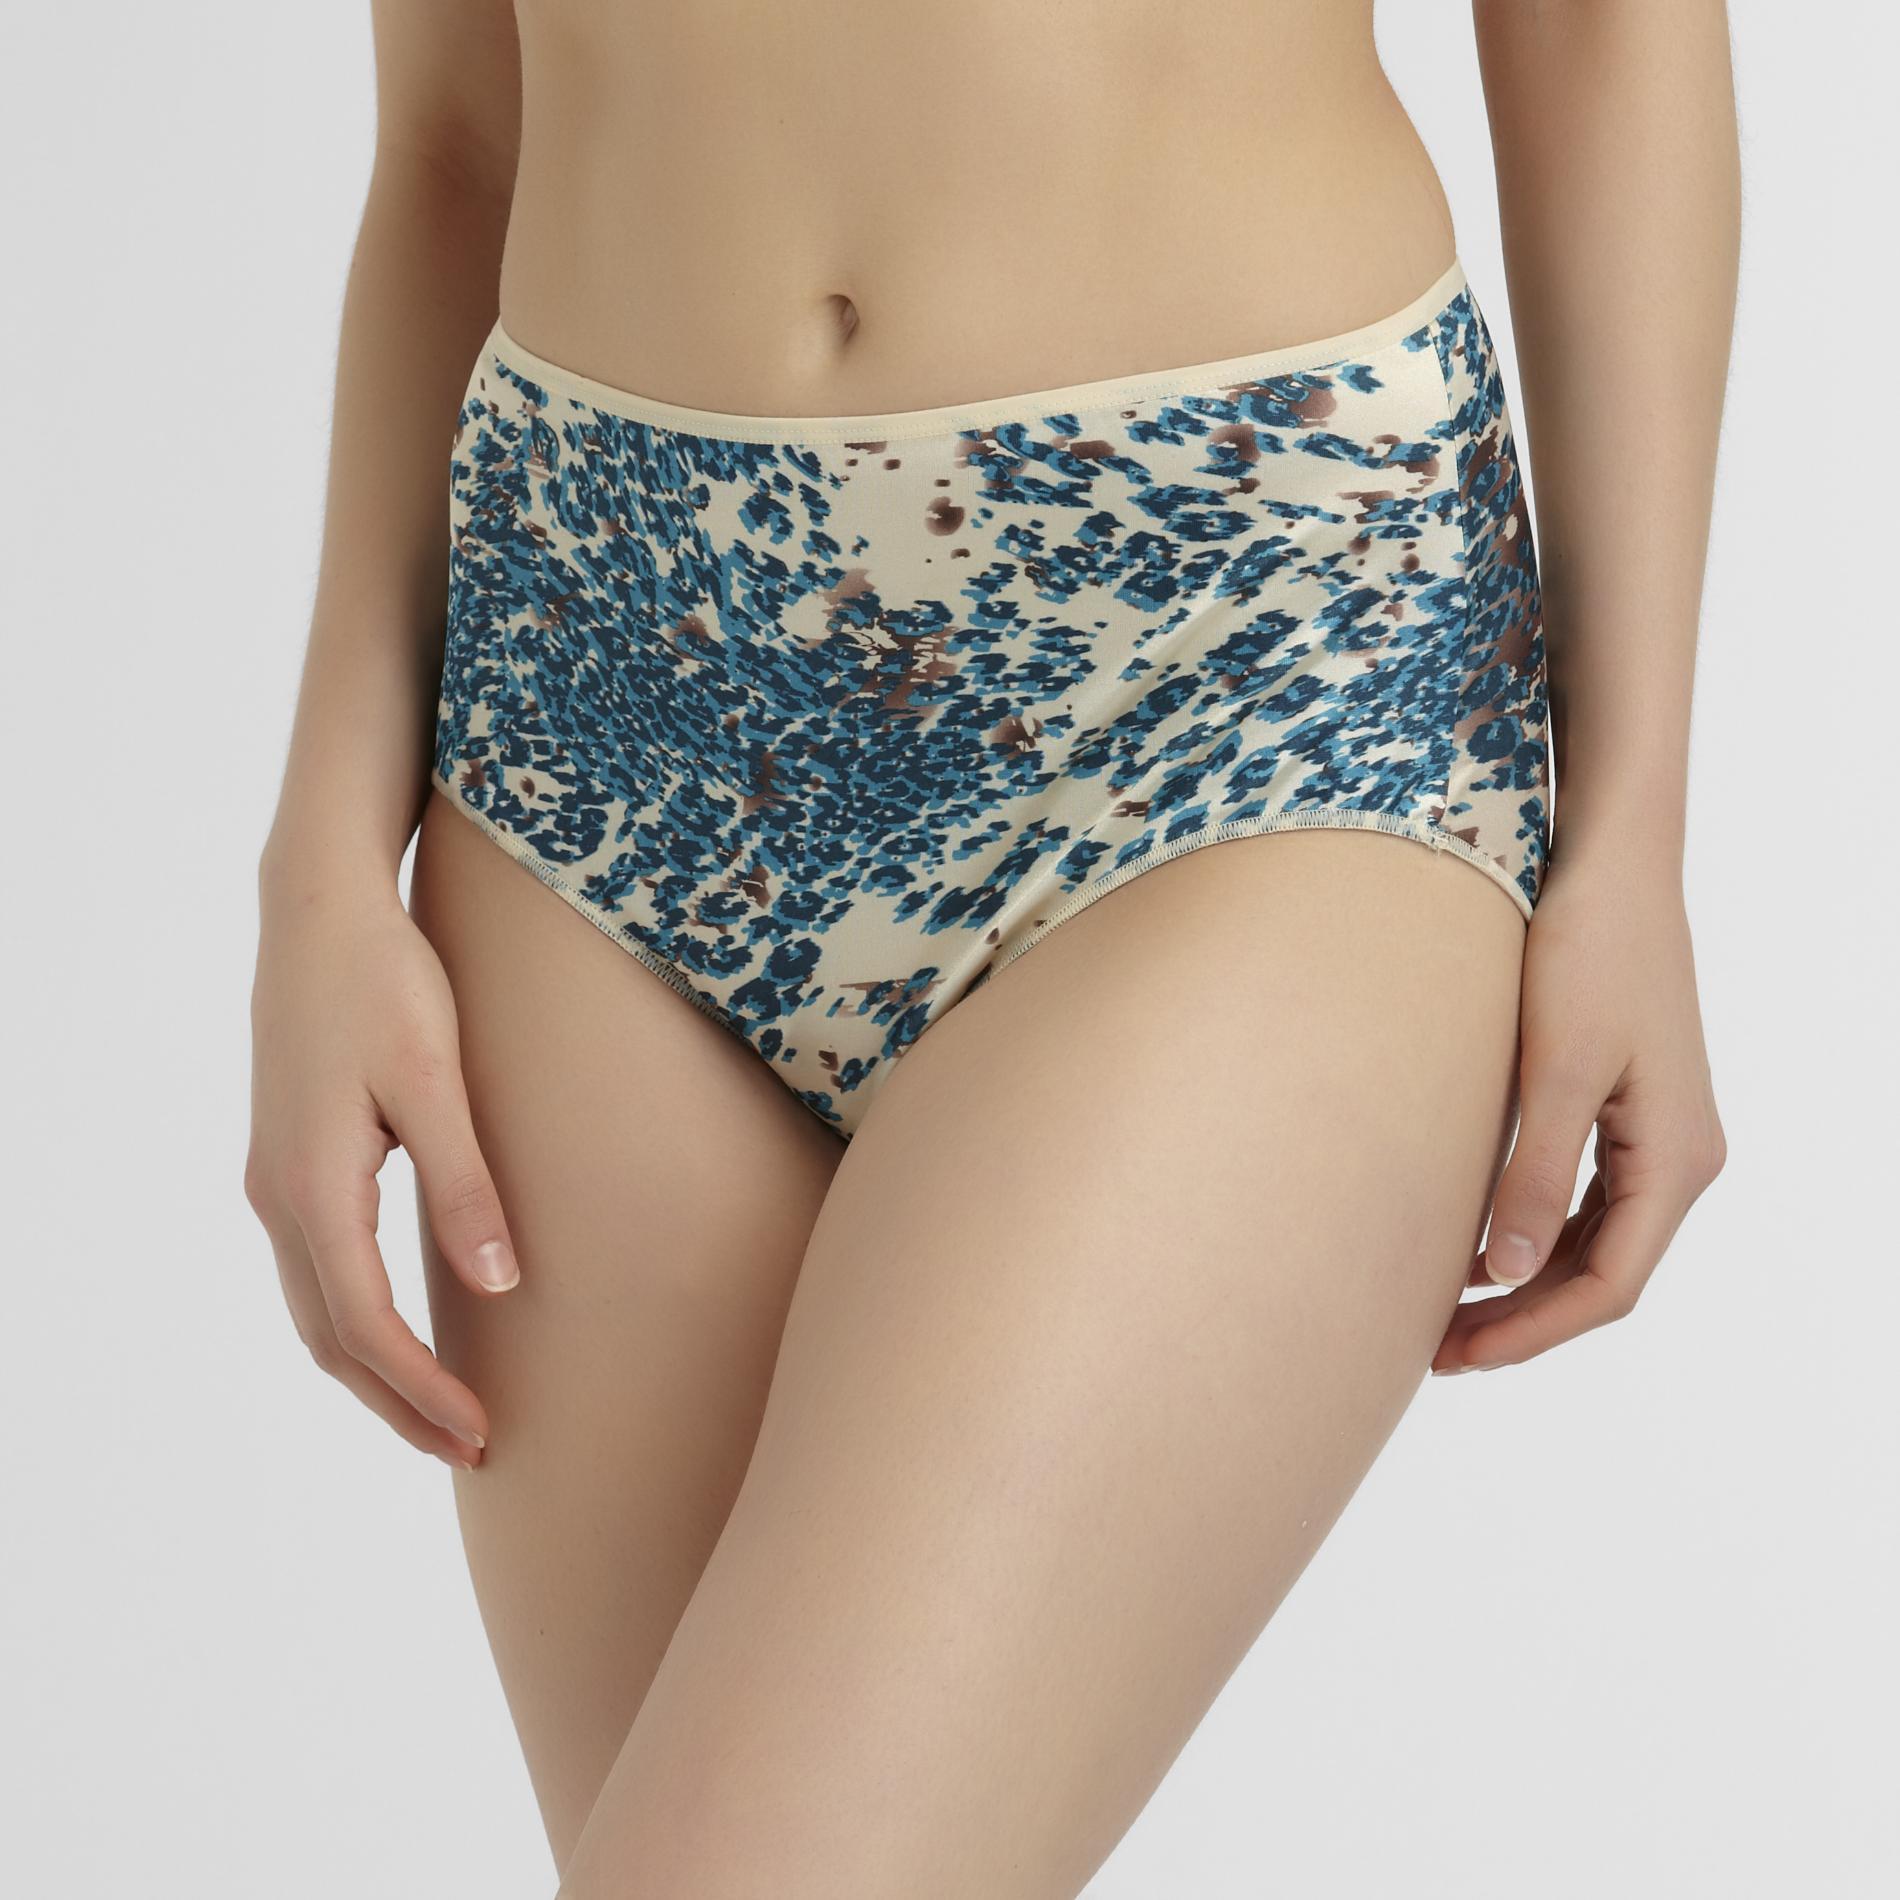 Hanes Women's Satin Stretch Brief Panties - 3-Pack